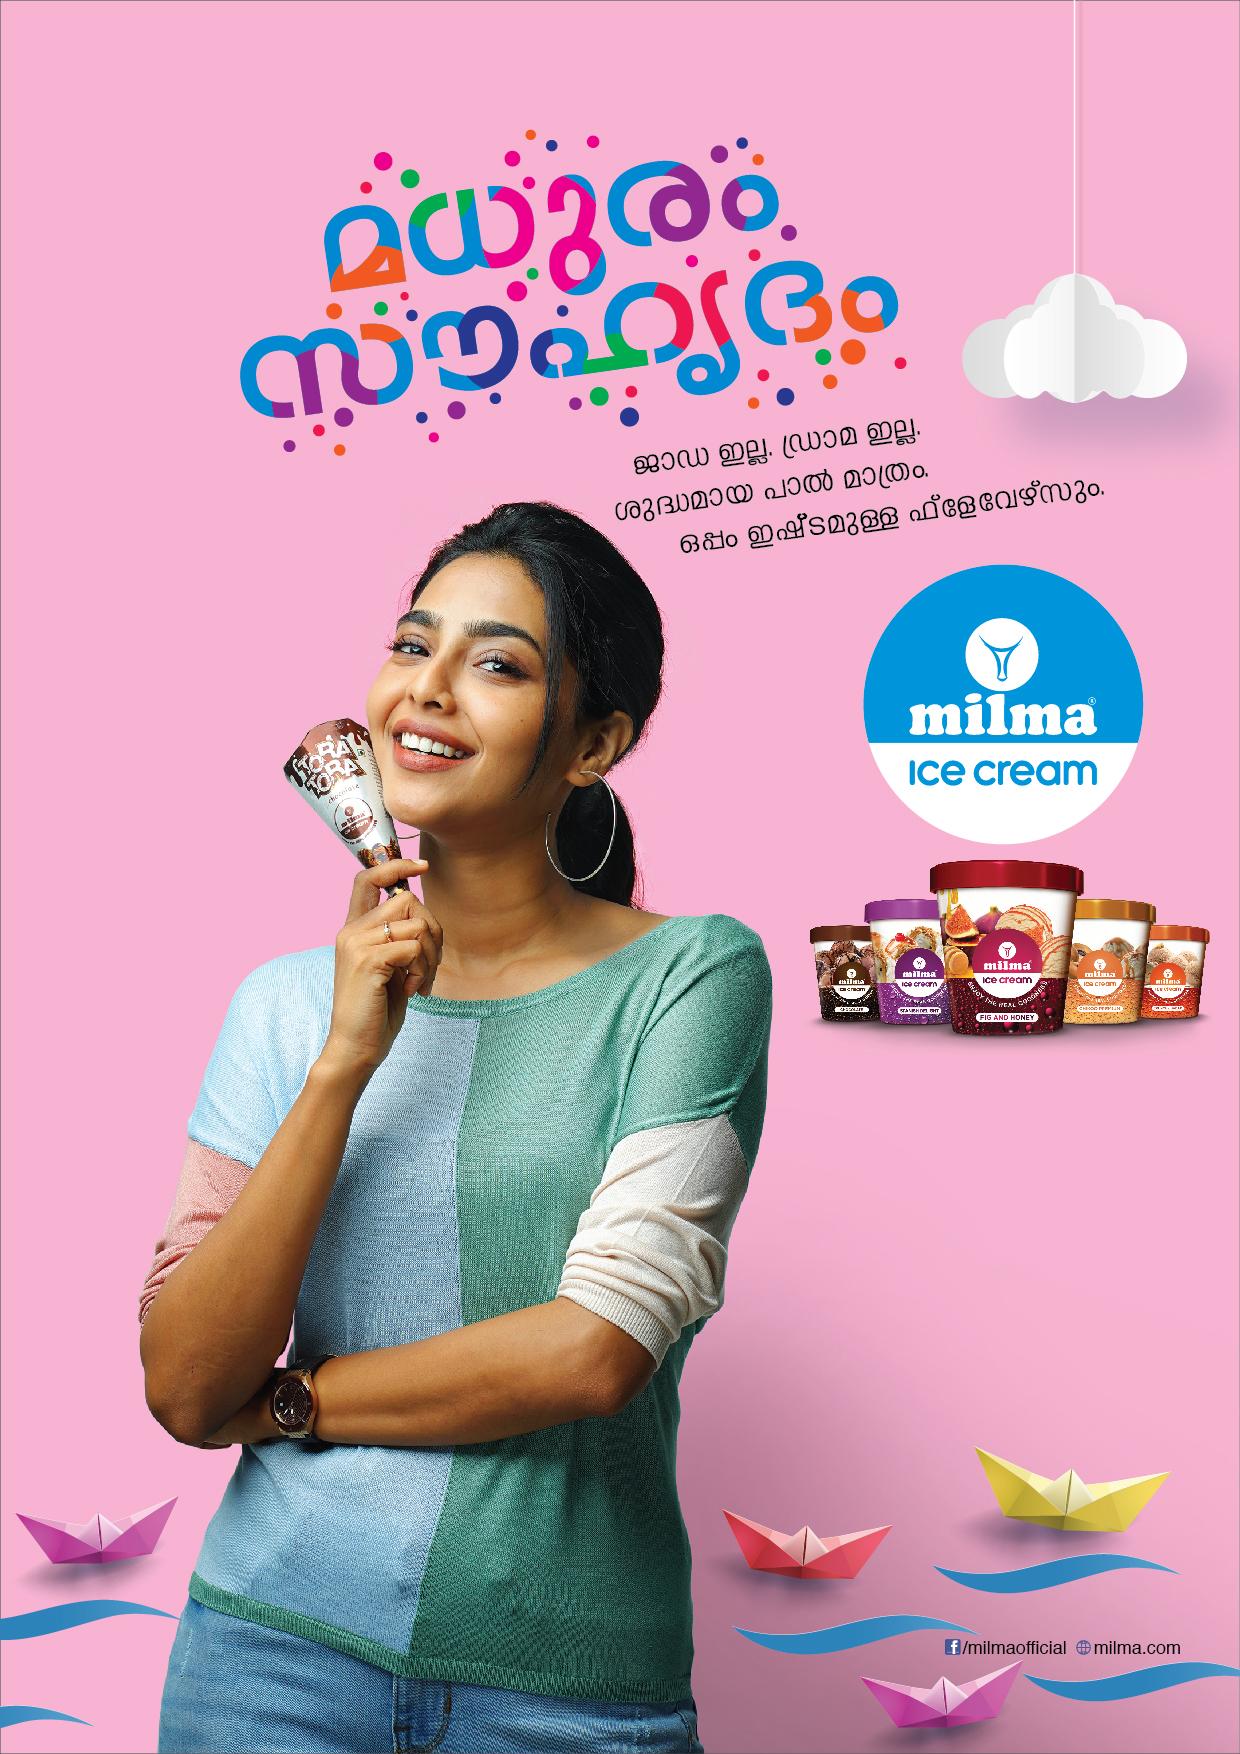 Milma Icecream Advertisement by Malayalam Actress Aishwarya Lekshmi | Print mock-up 5 by Stark Communications Pvt Ltd